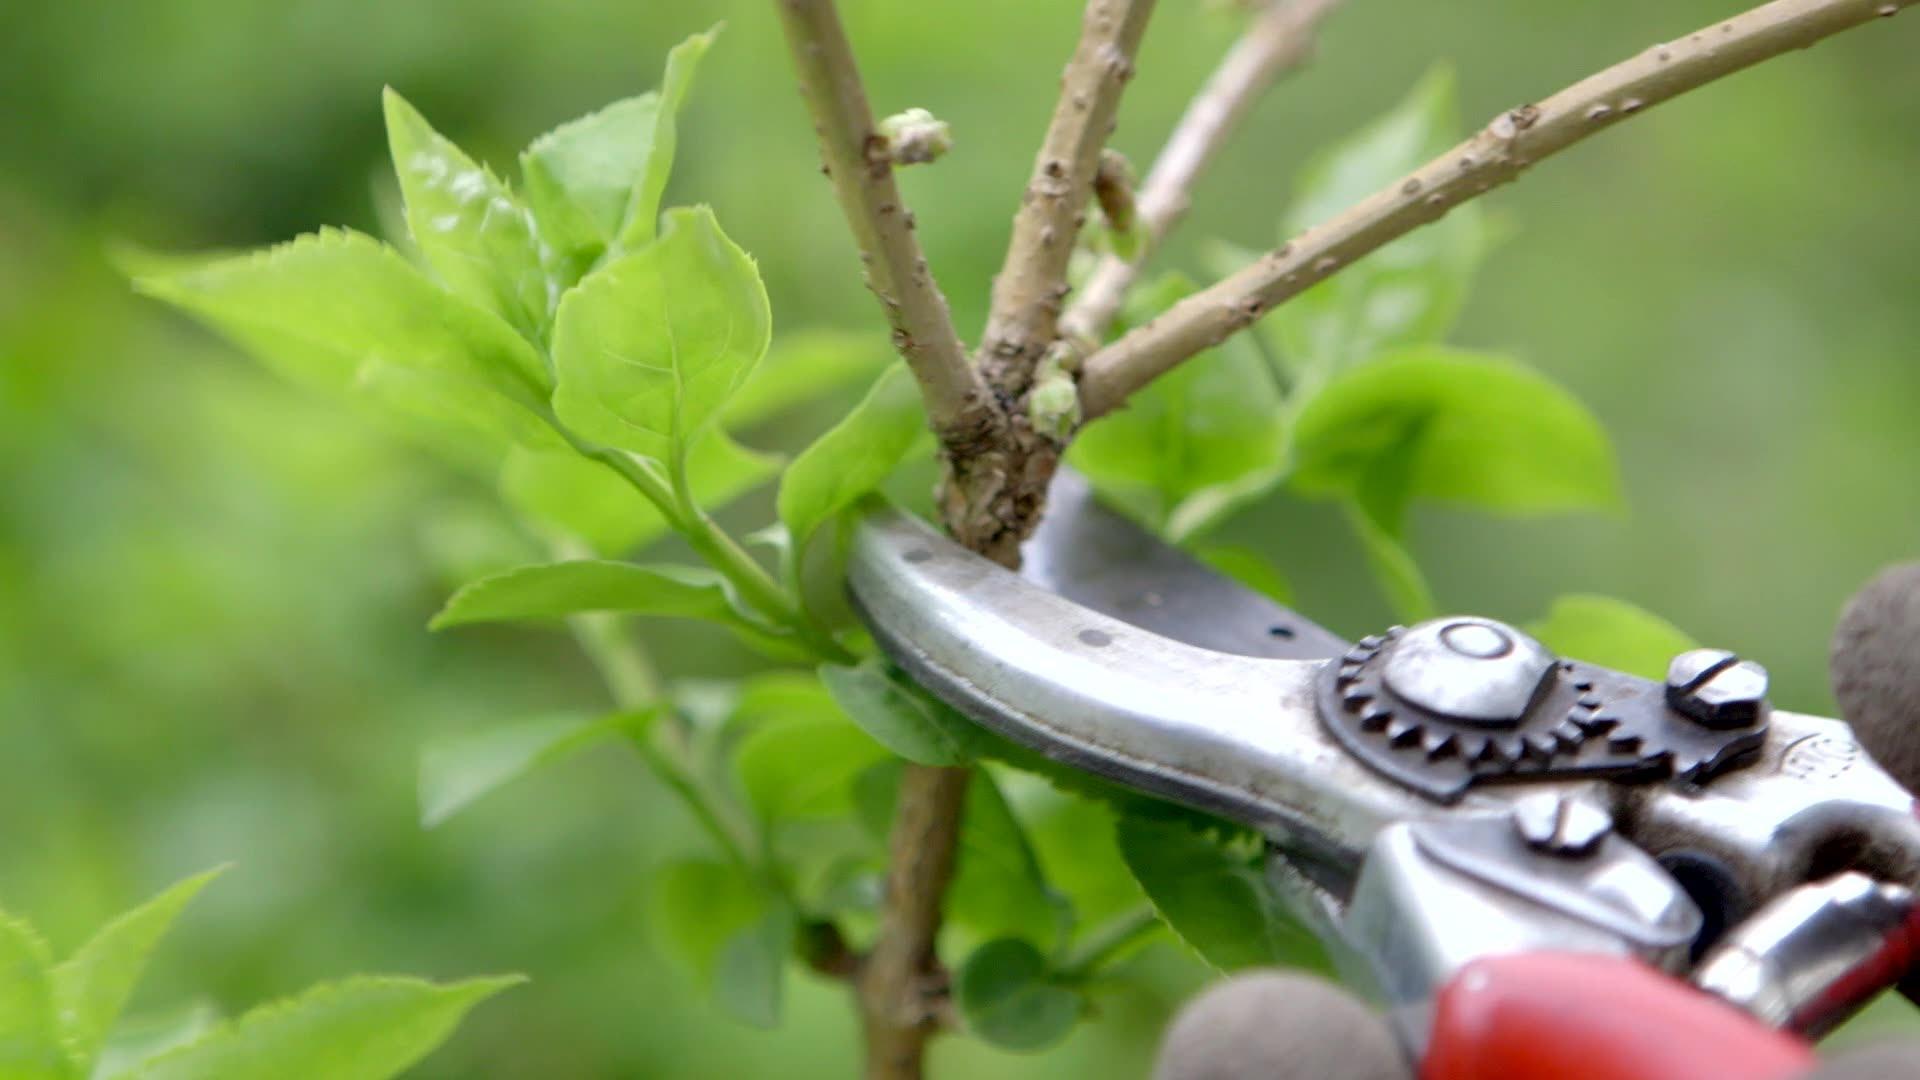 How to Prune Flowering Shrubs - Bees and Roses| Prune Shrubs, How to Prune Shrubs, Easily Prune Shrubs, Gardening, Gardening TIps and Tricks, Gardening Hacks, Flowering Shrub Care, Popular Pin #Shrubs #PruneShrubs